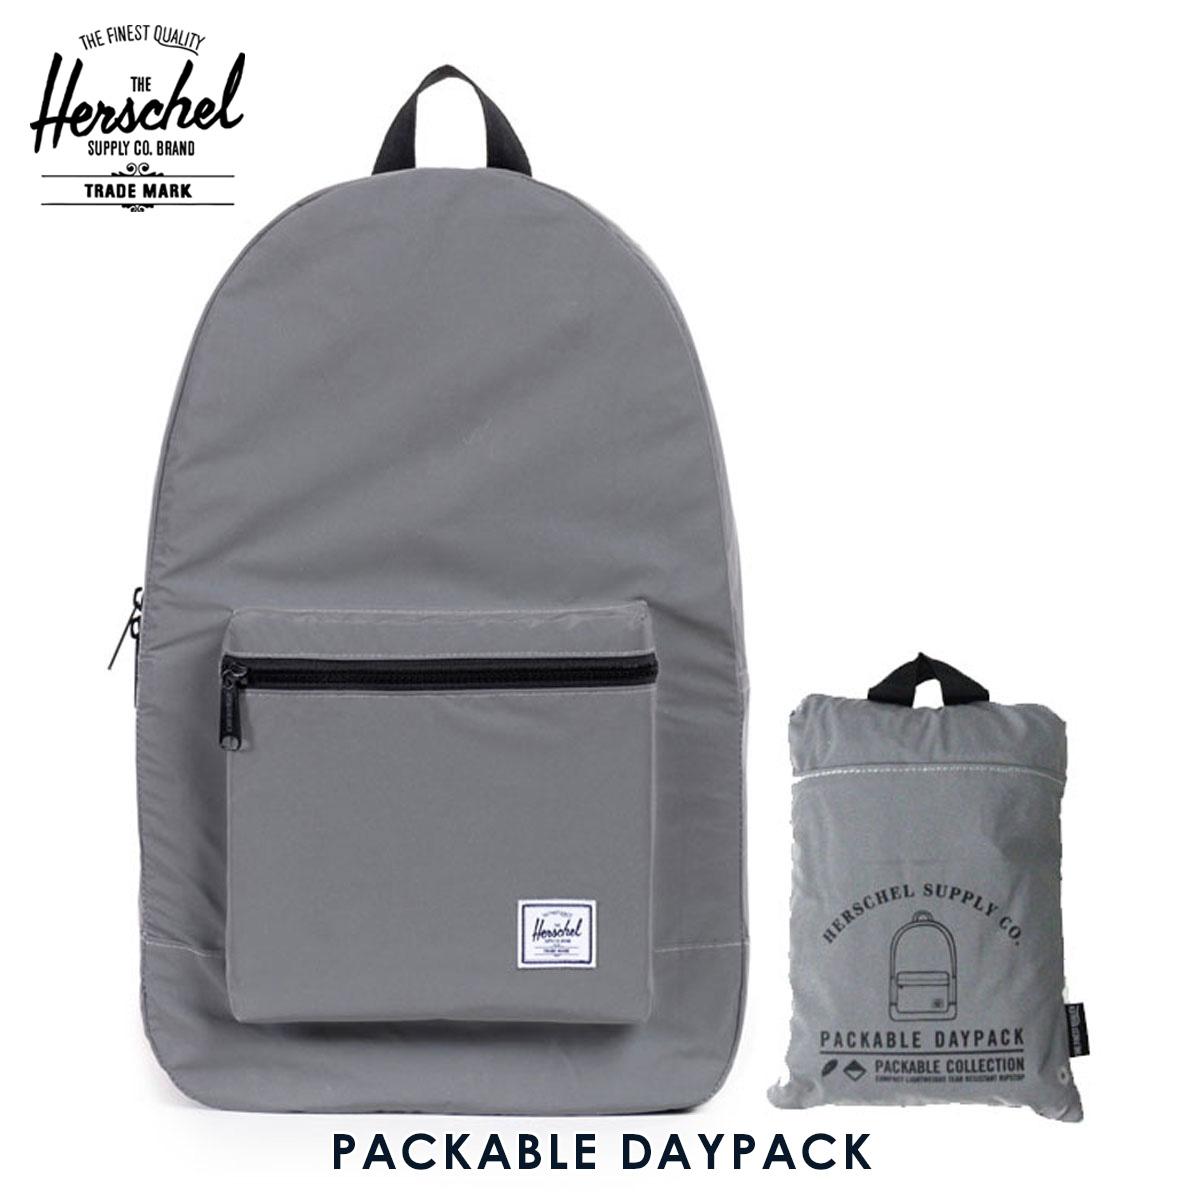 Herschel Herschel bag rucksack Packable Daypack - 3 M Packable Day Night  10076-00722-OS Silver Reflective P16Sep15 3e9355ae6fb54